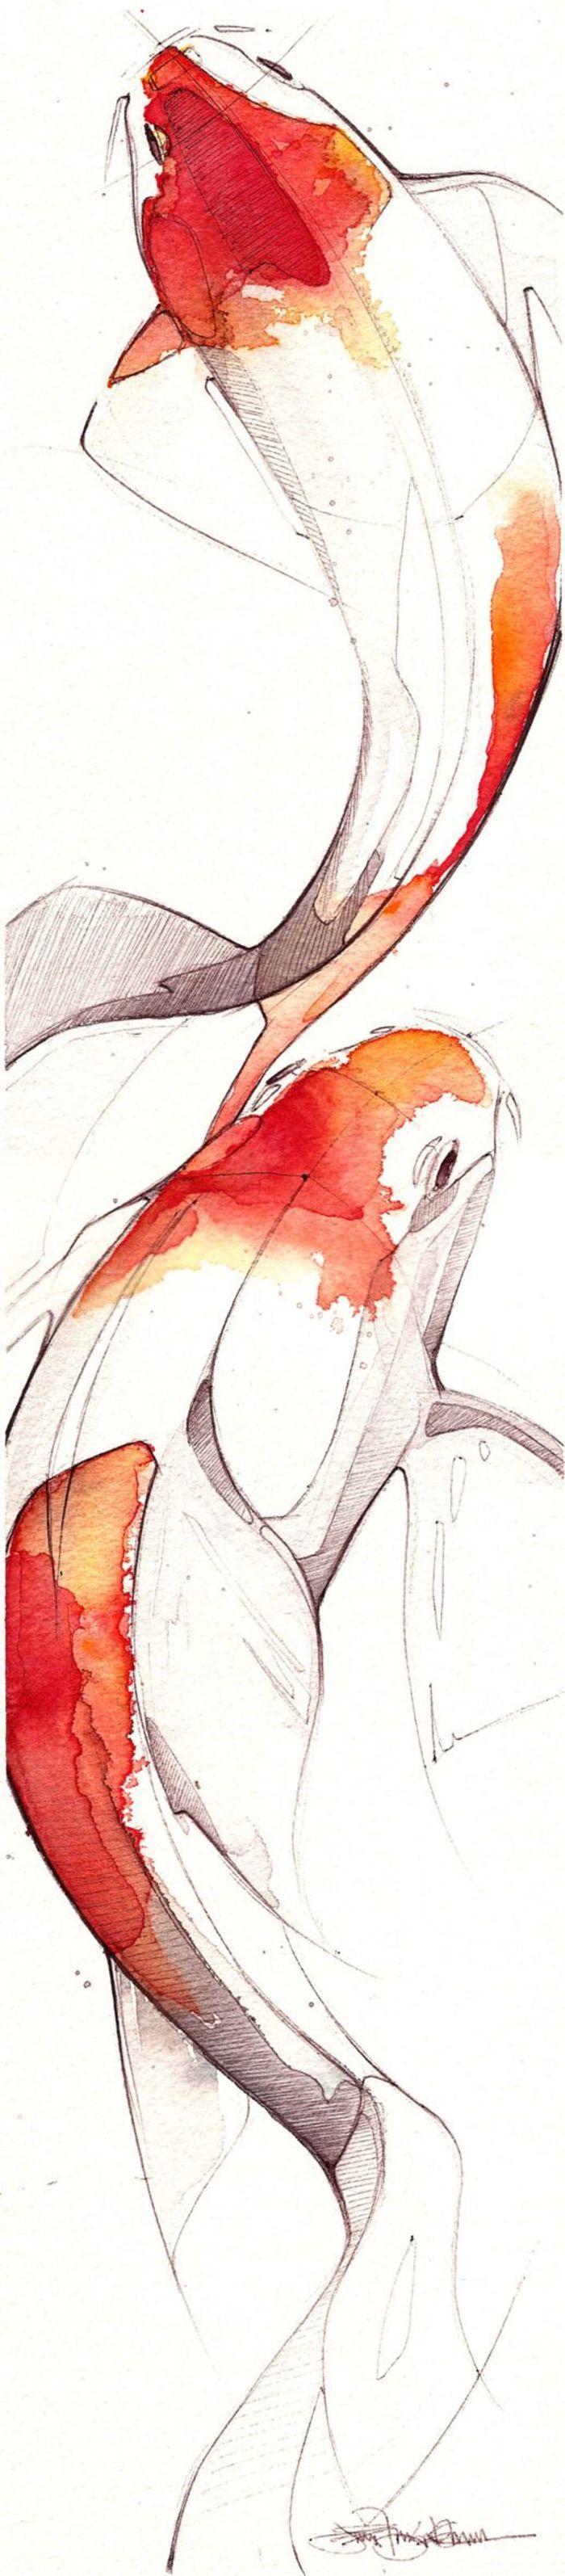 Koi by Jennifer Kraska. So simple lines and colour